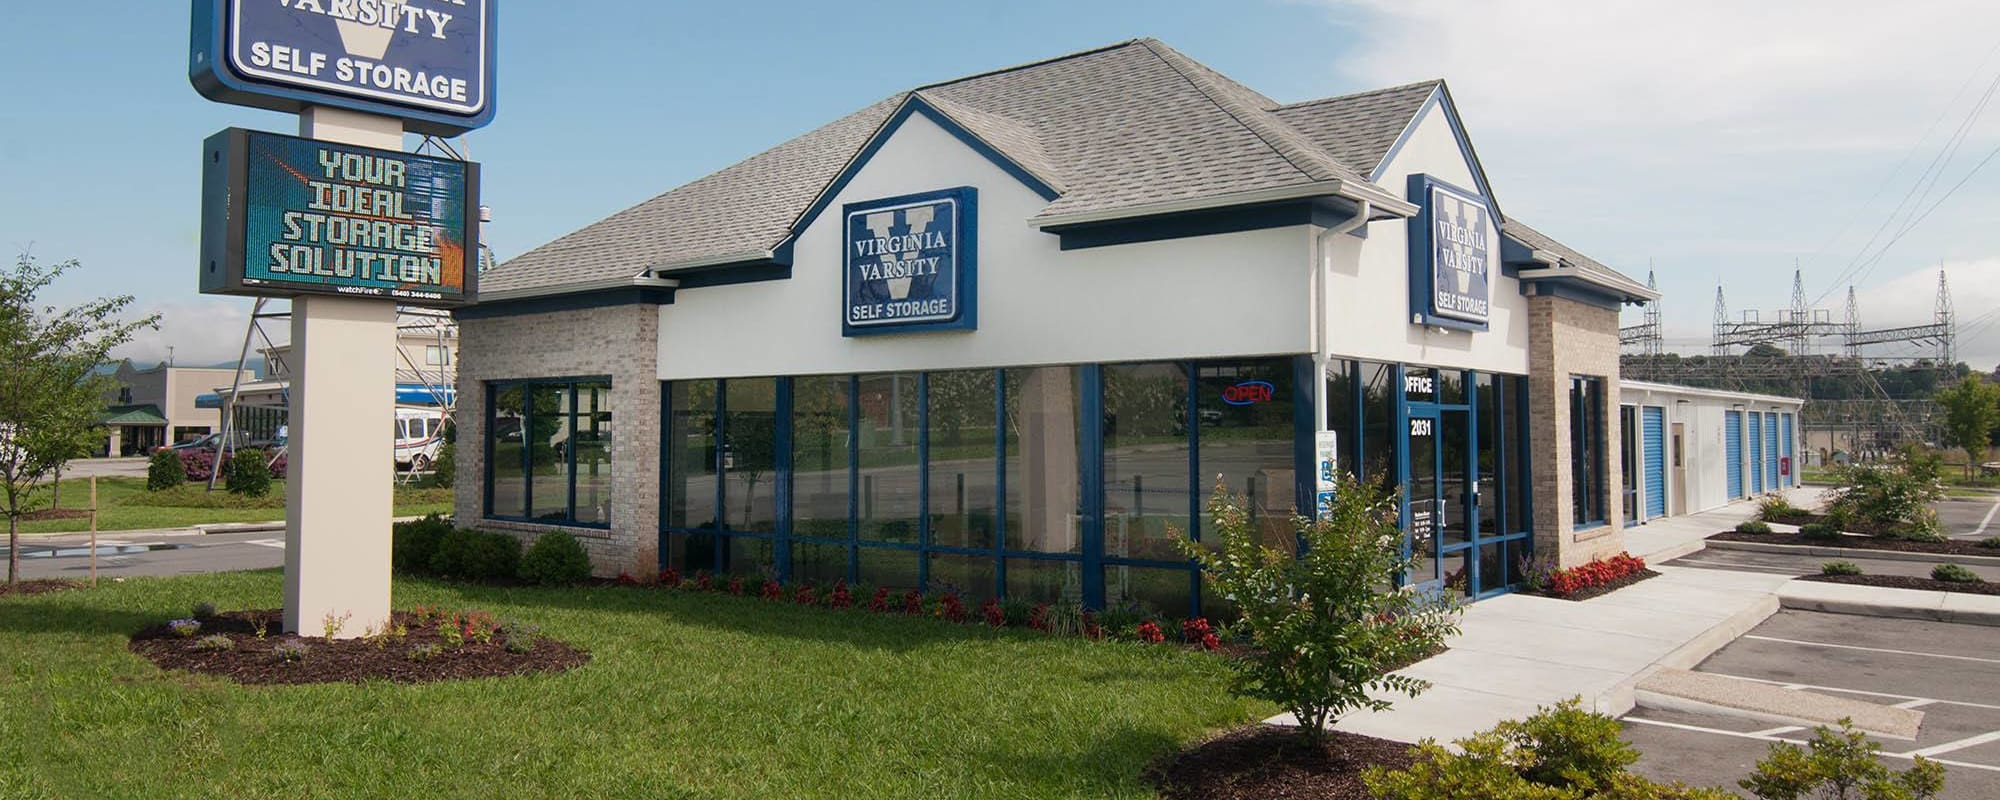 Storage tips from Virginia Varsity Storage in Salem, Virginia